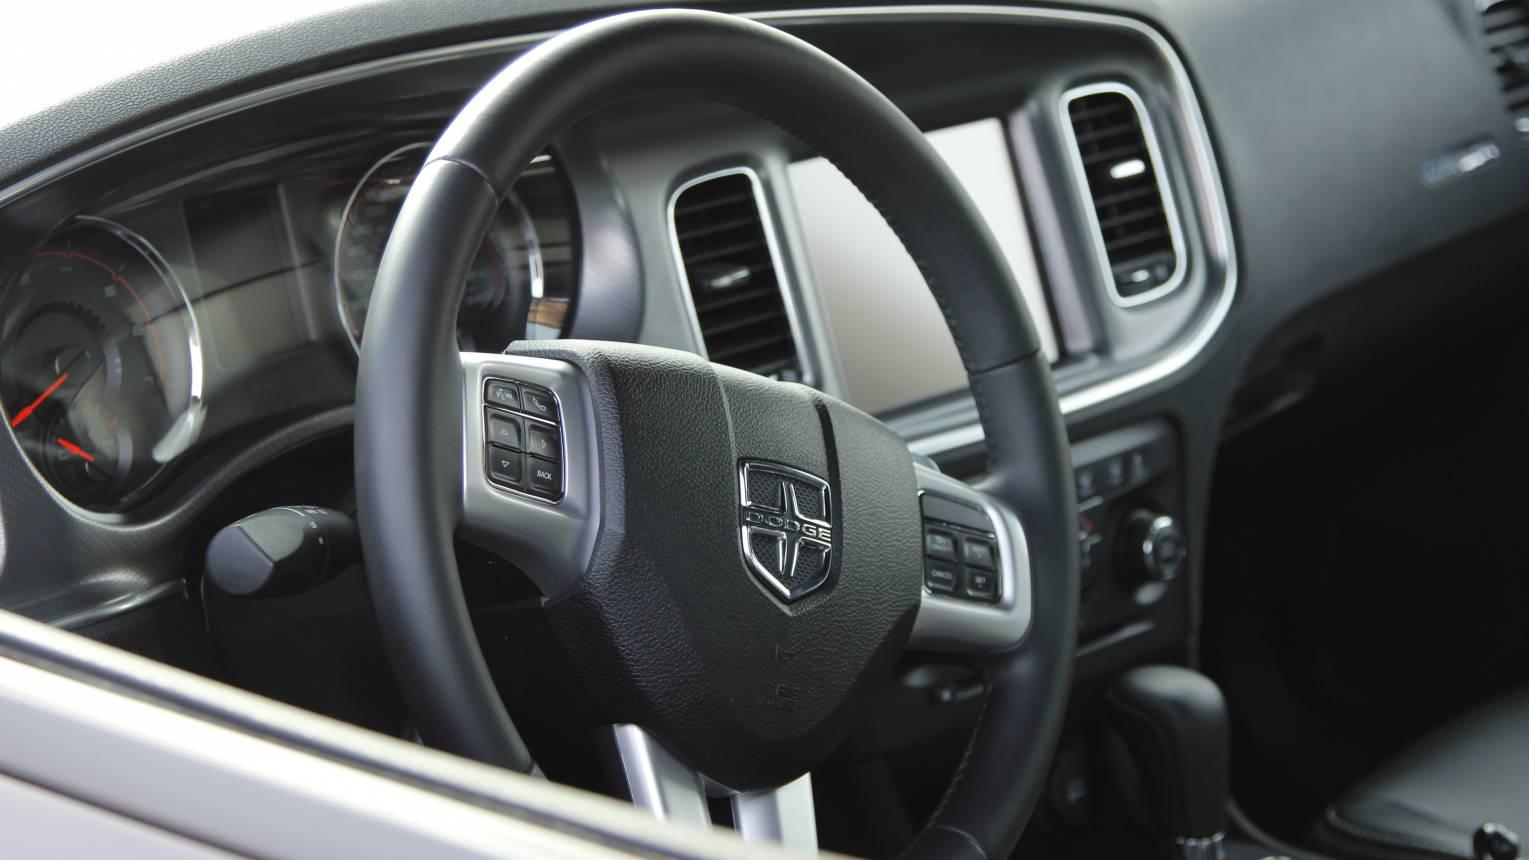 400 LE-ős Dodge Charger Need for Speed rendőrautóval utcai vezetés